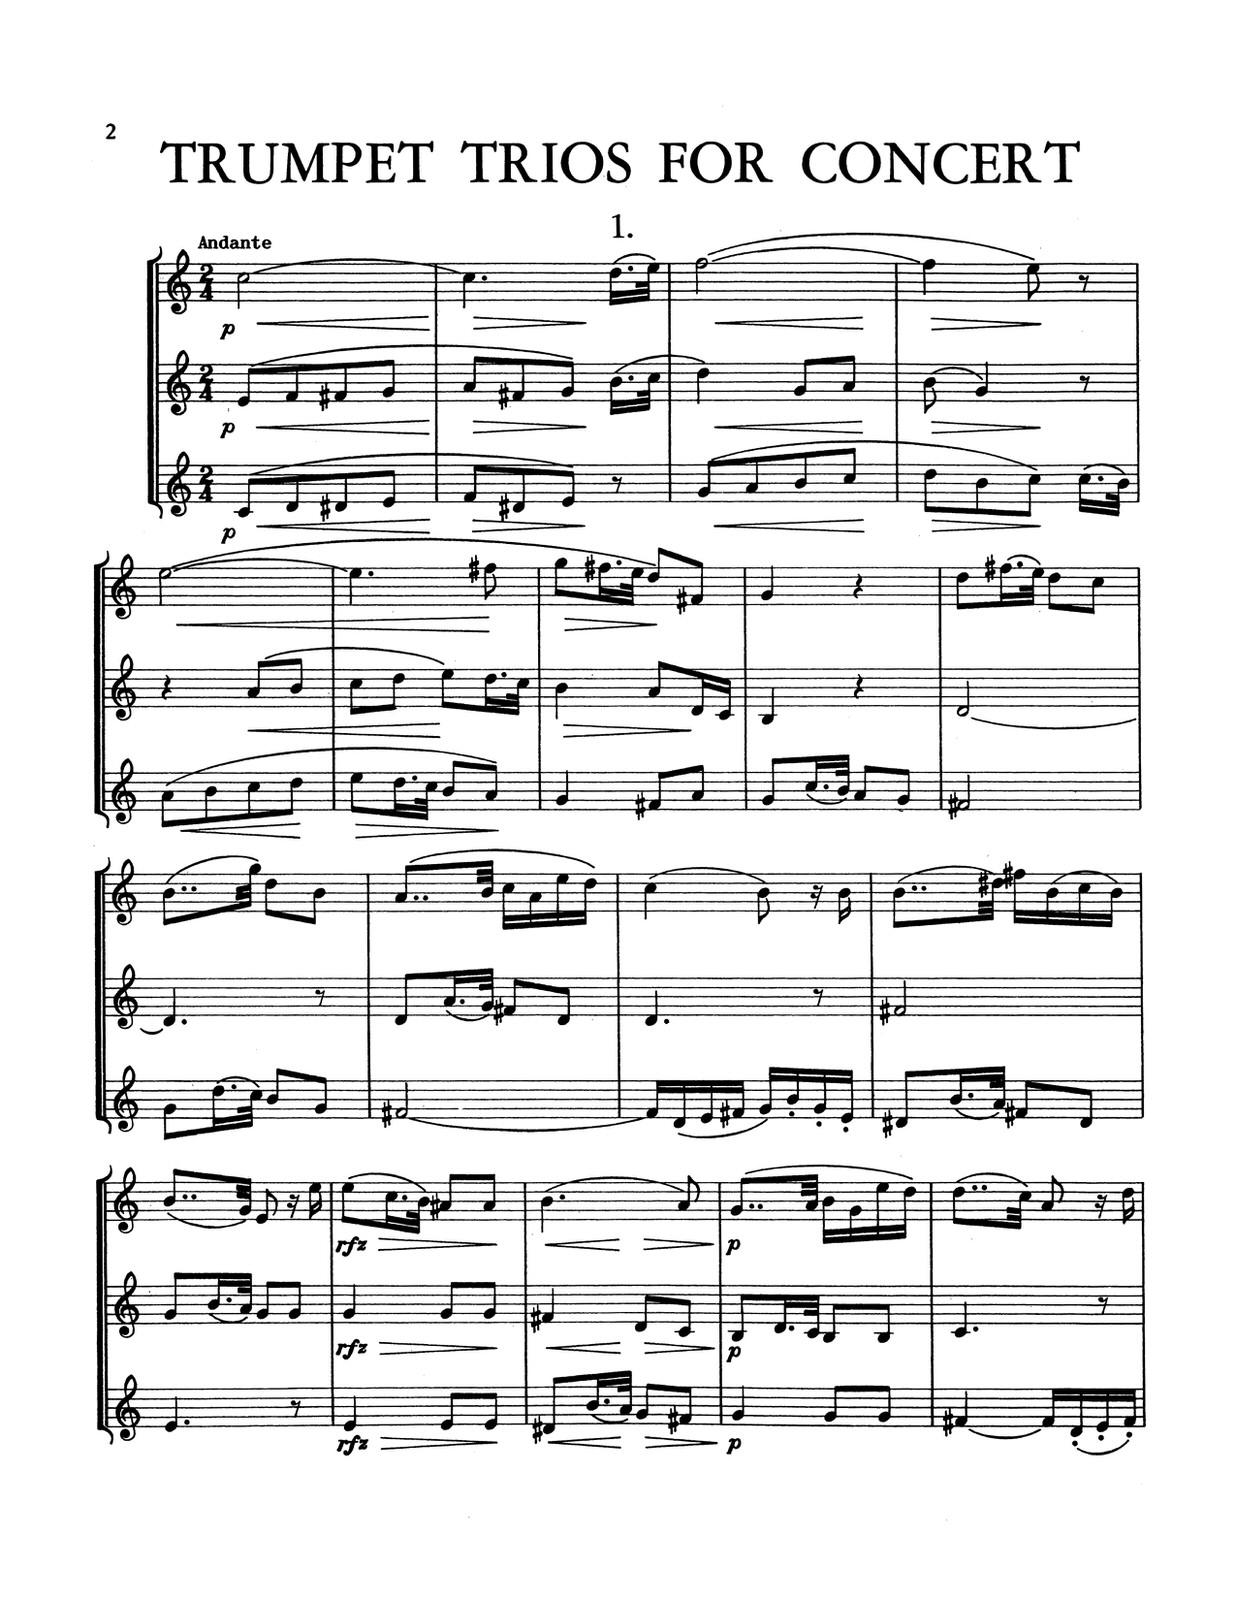 Kresser, Trumpet Trios for Concert-p04